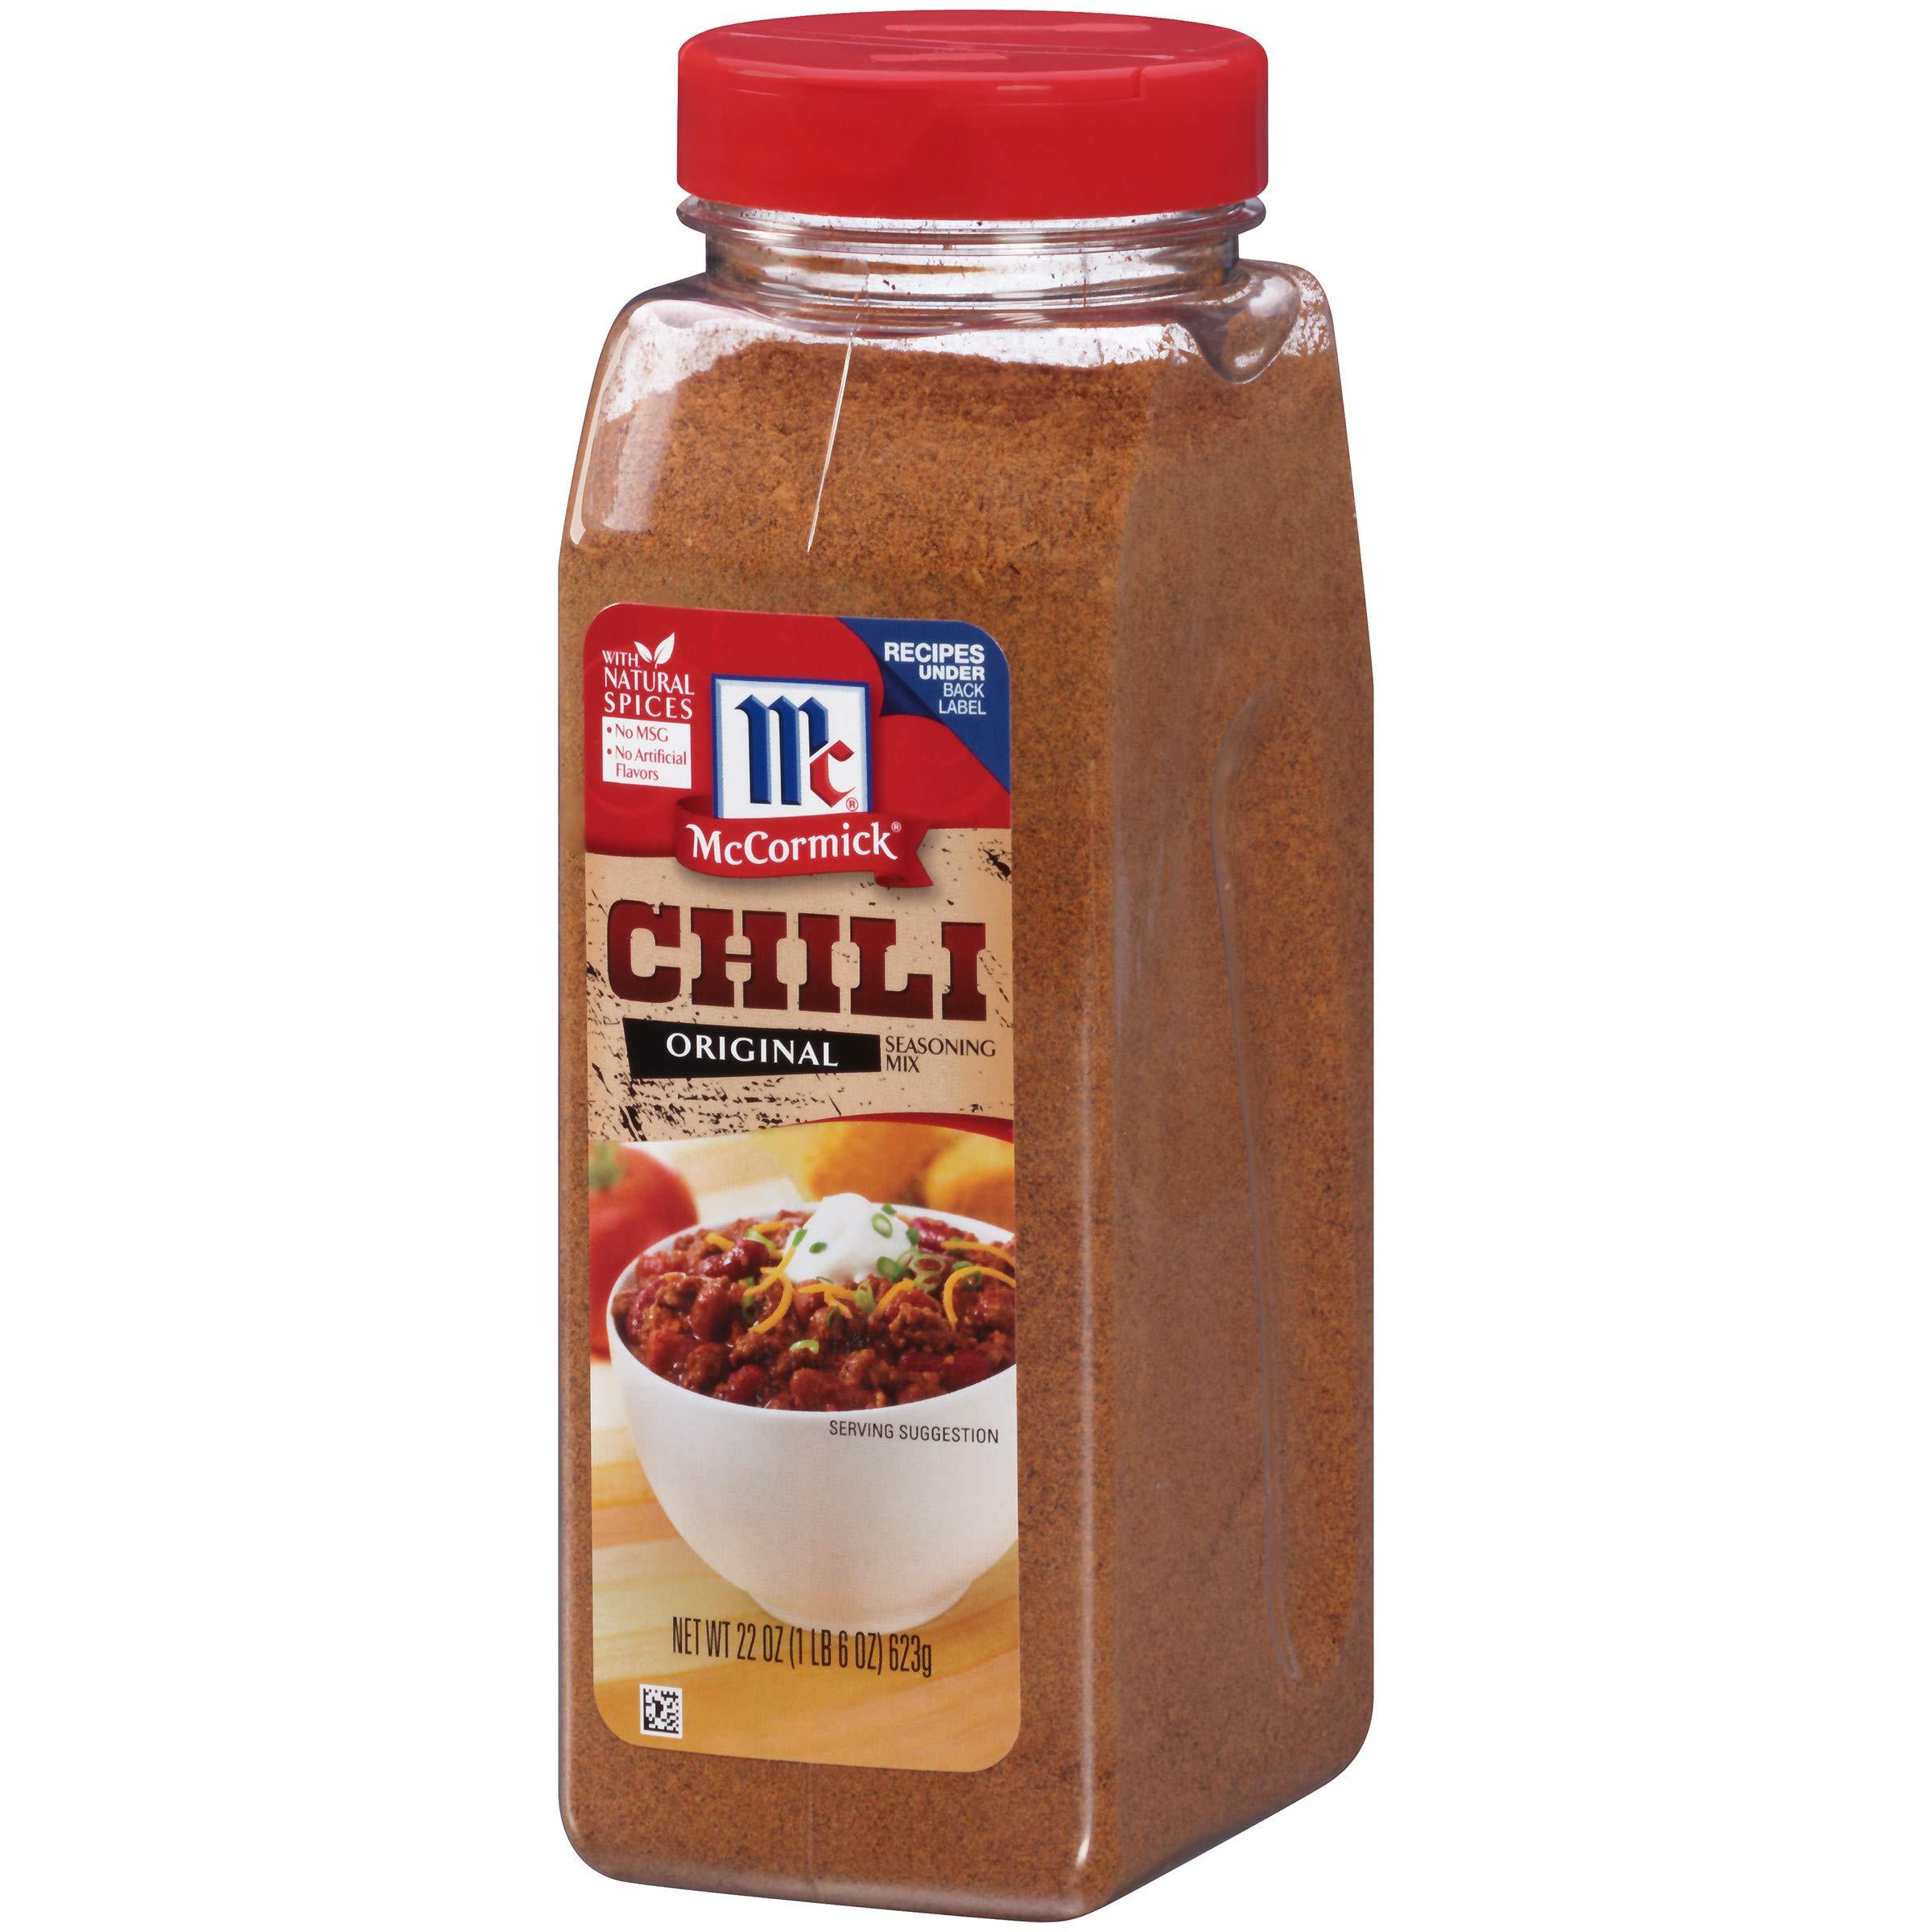 McCormick Original Chili Seasoning Mix, 22 oz